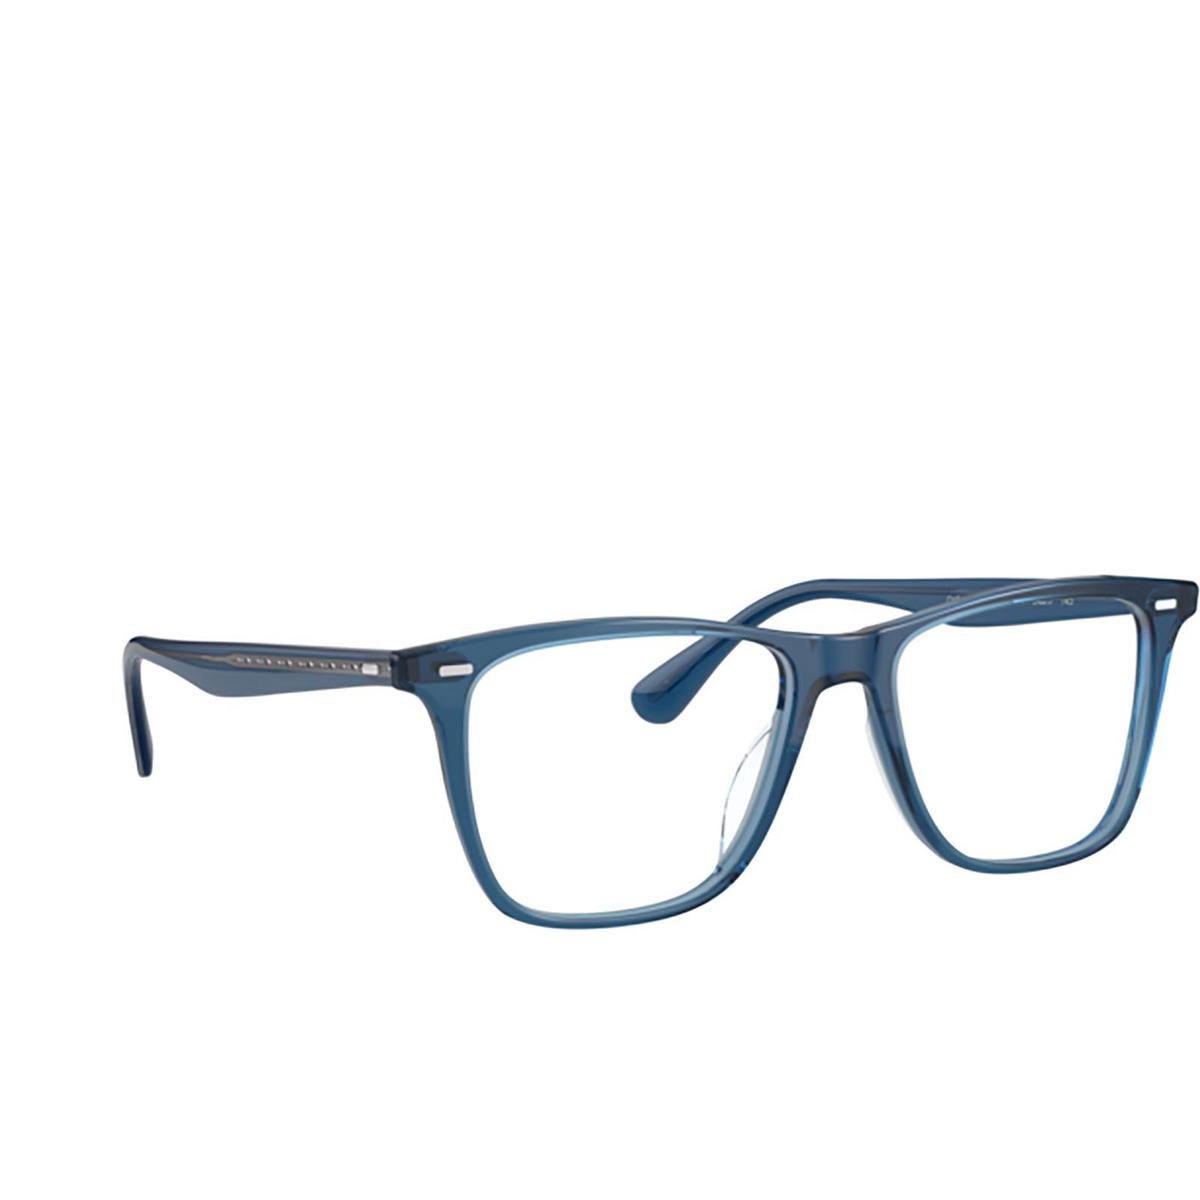 Oliver Peoples® Square Eyeglasses: Ollis OV5437U color Deep Blue 1670 - three-quarters view.